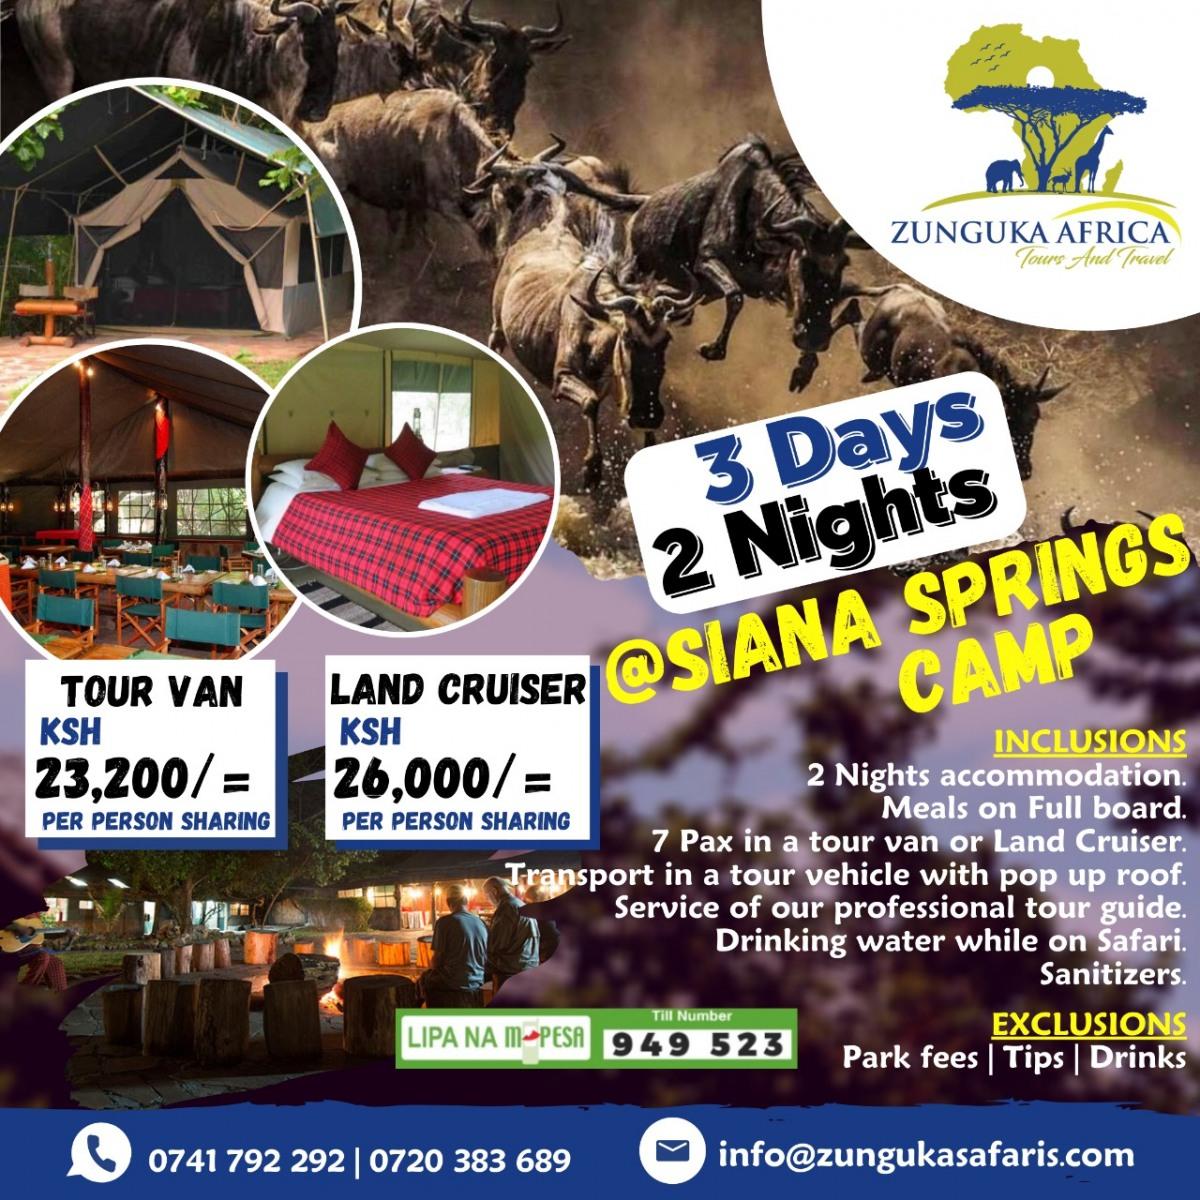 siana-springs-camp